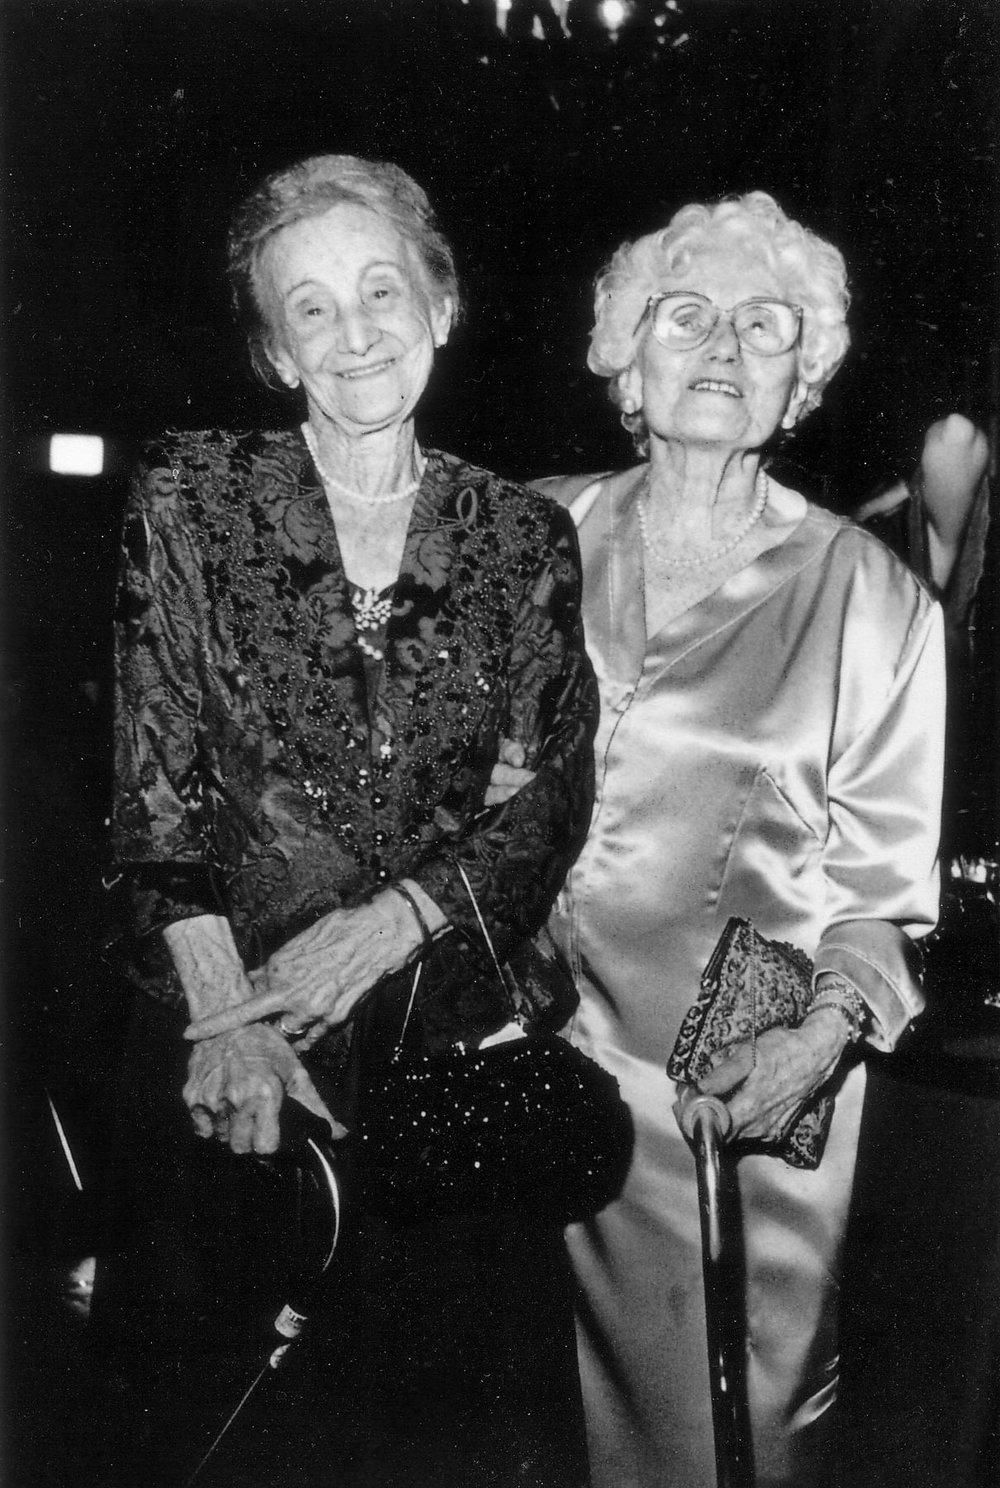 Aunt Sharika, left, and Grandma Piri, right, 1996.